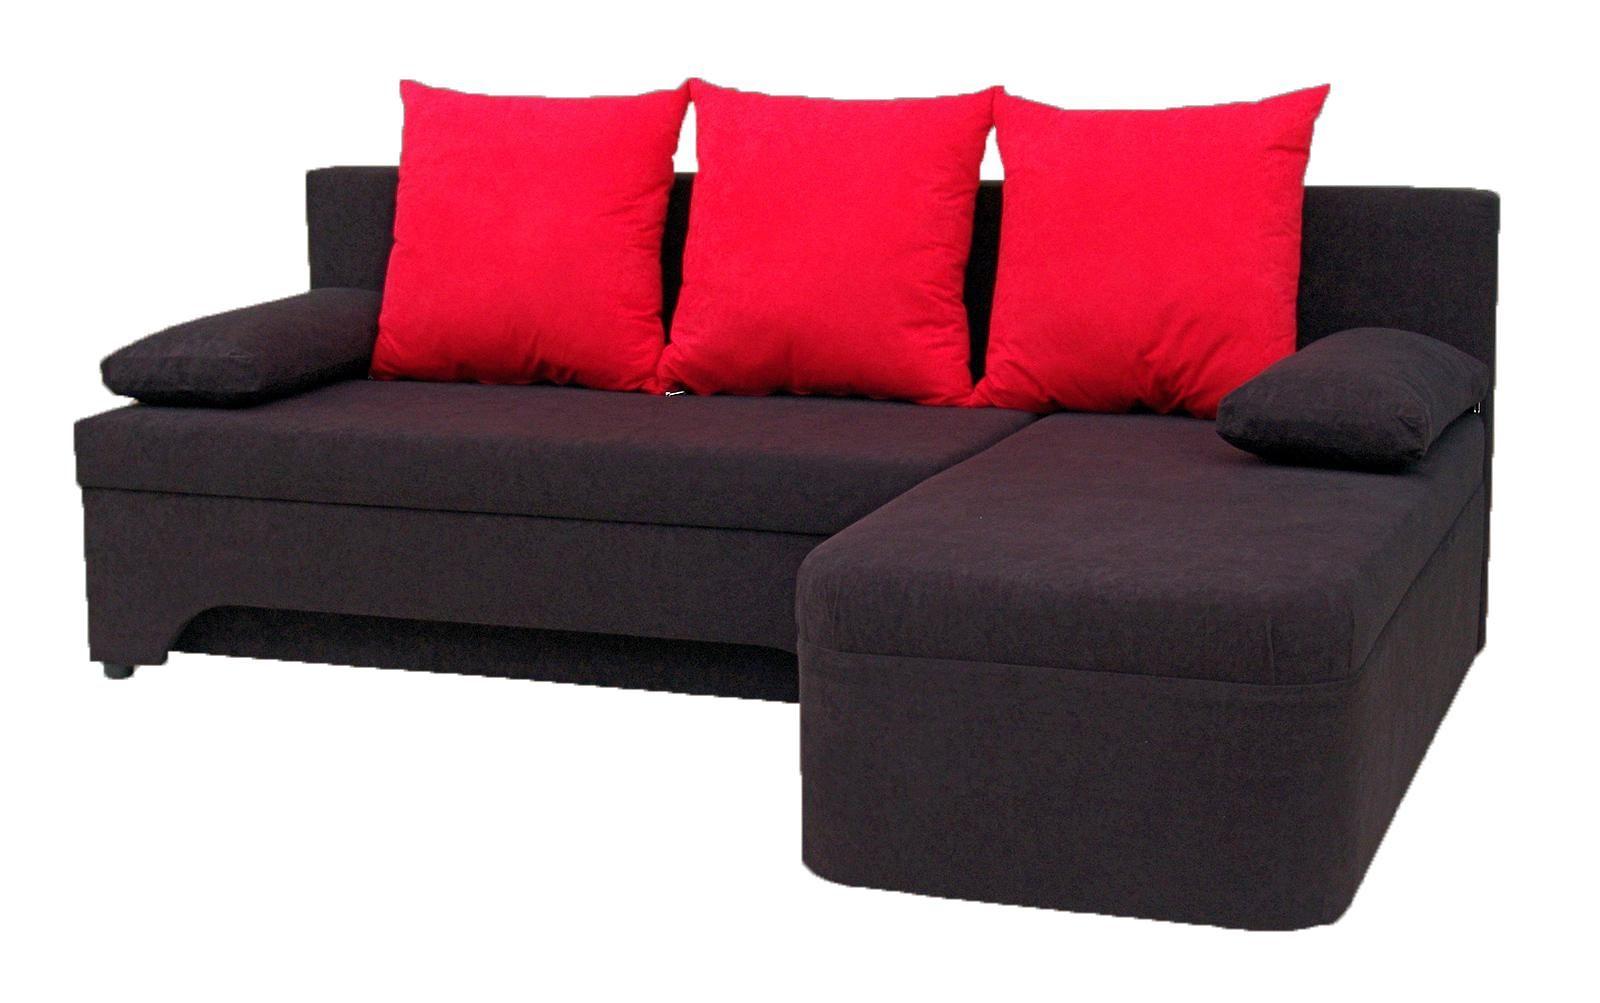 Sofa Rozkladana Narozna Meblobranie Pl Sectional Couch Sofa